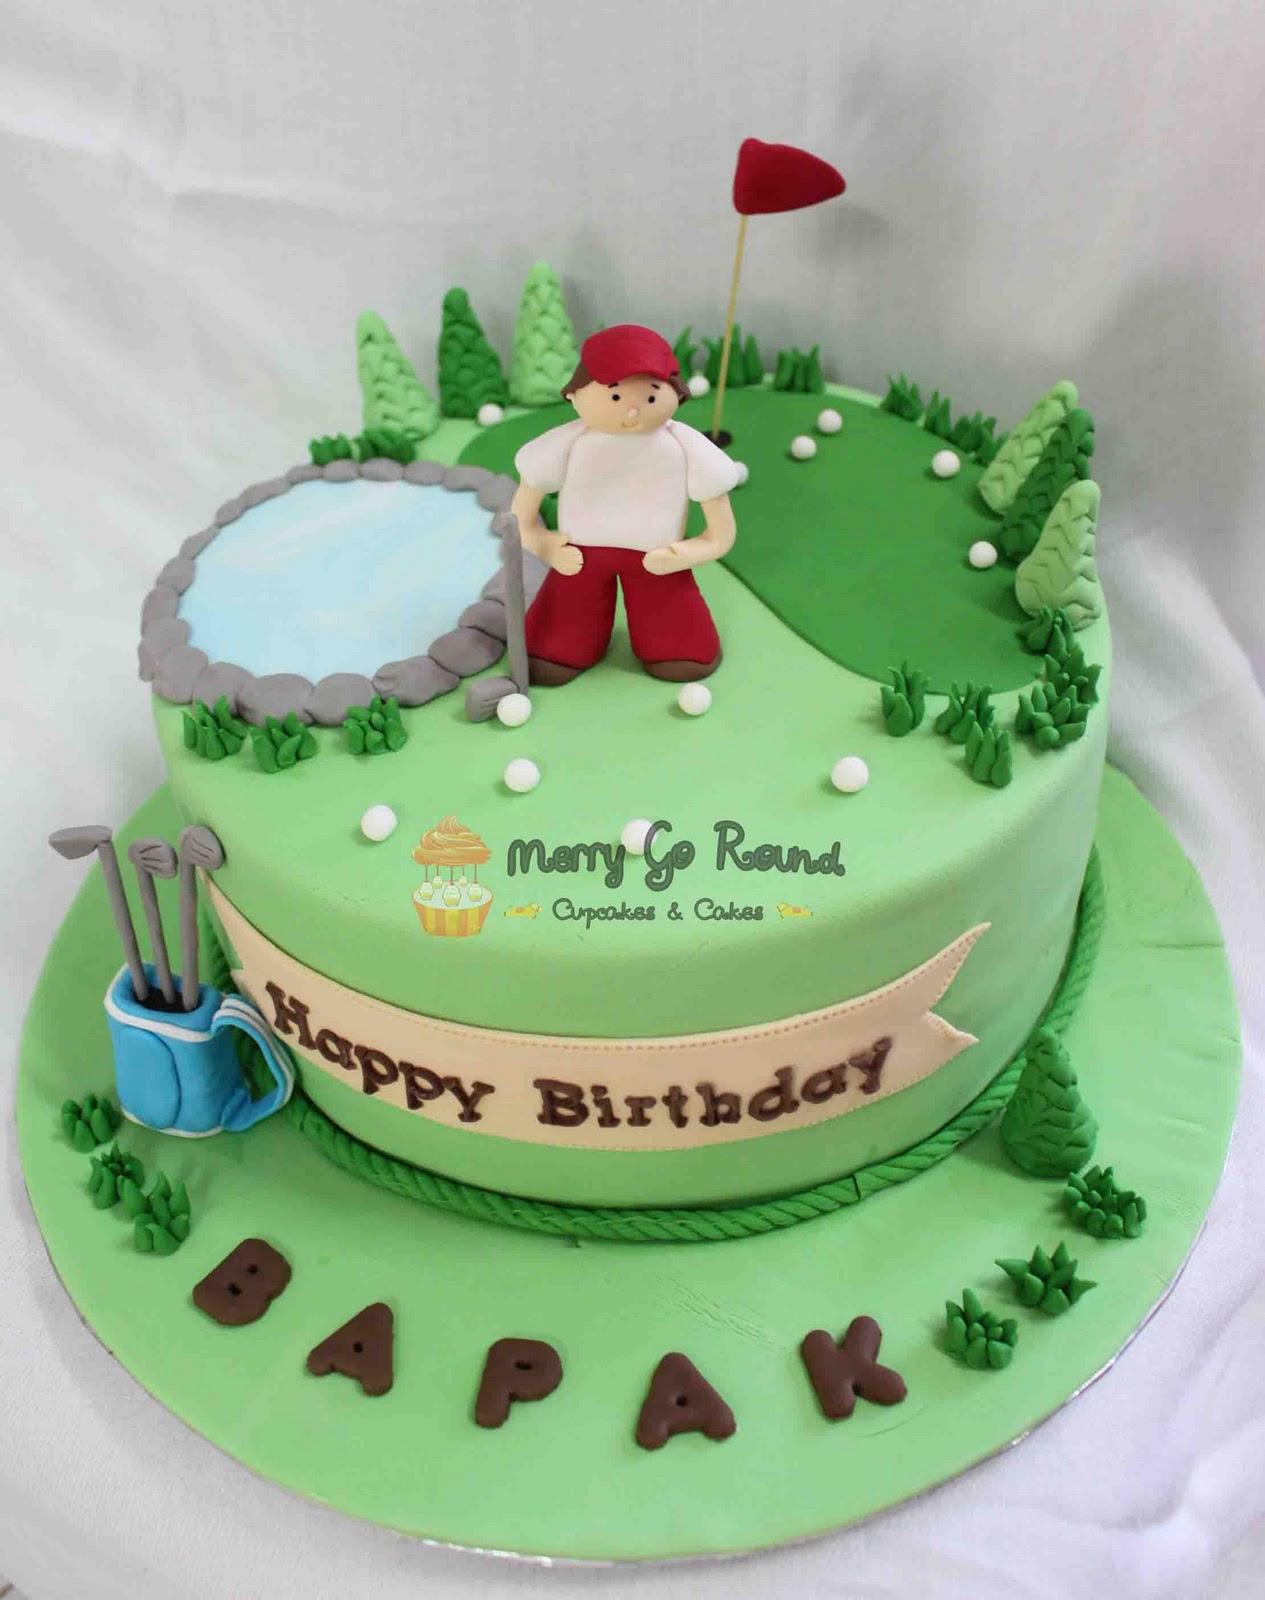 Birthday Cake Ideas Golf : Golf Birthday Cake Cake Ideas and Designs